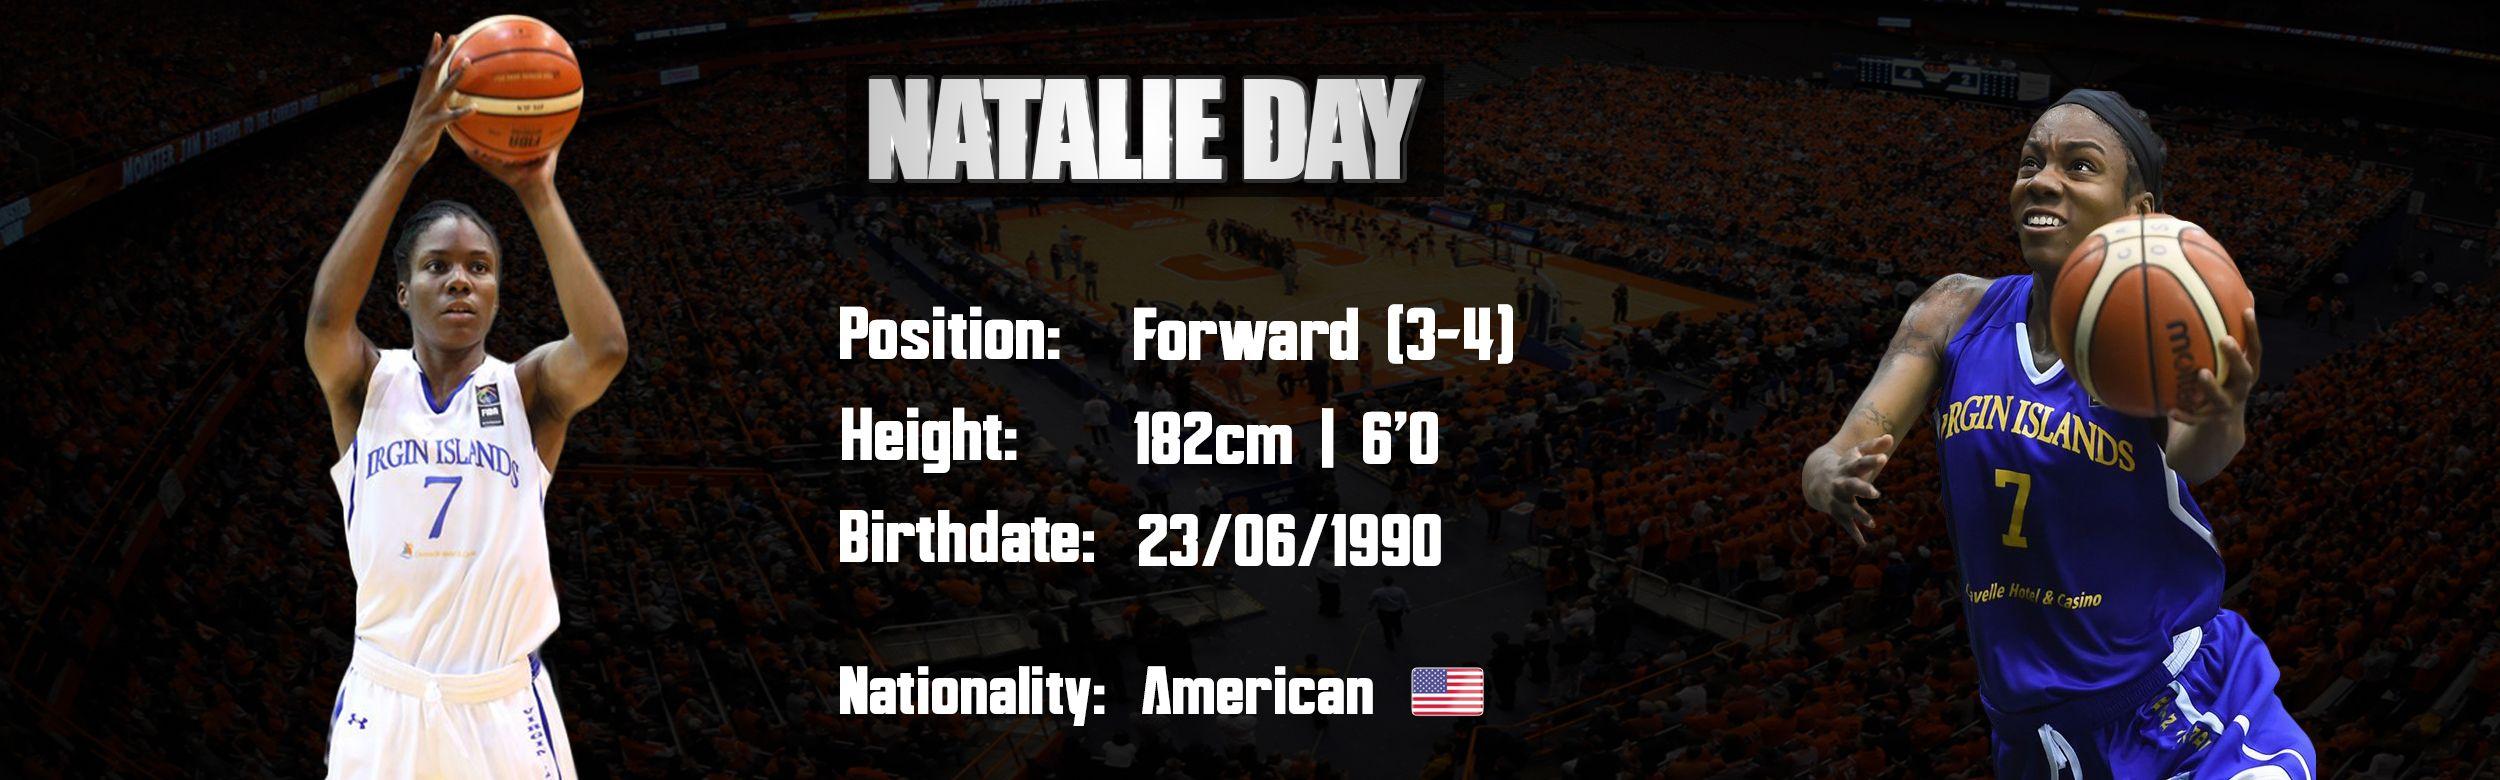 Natalie Day